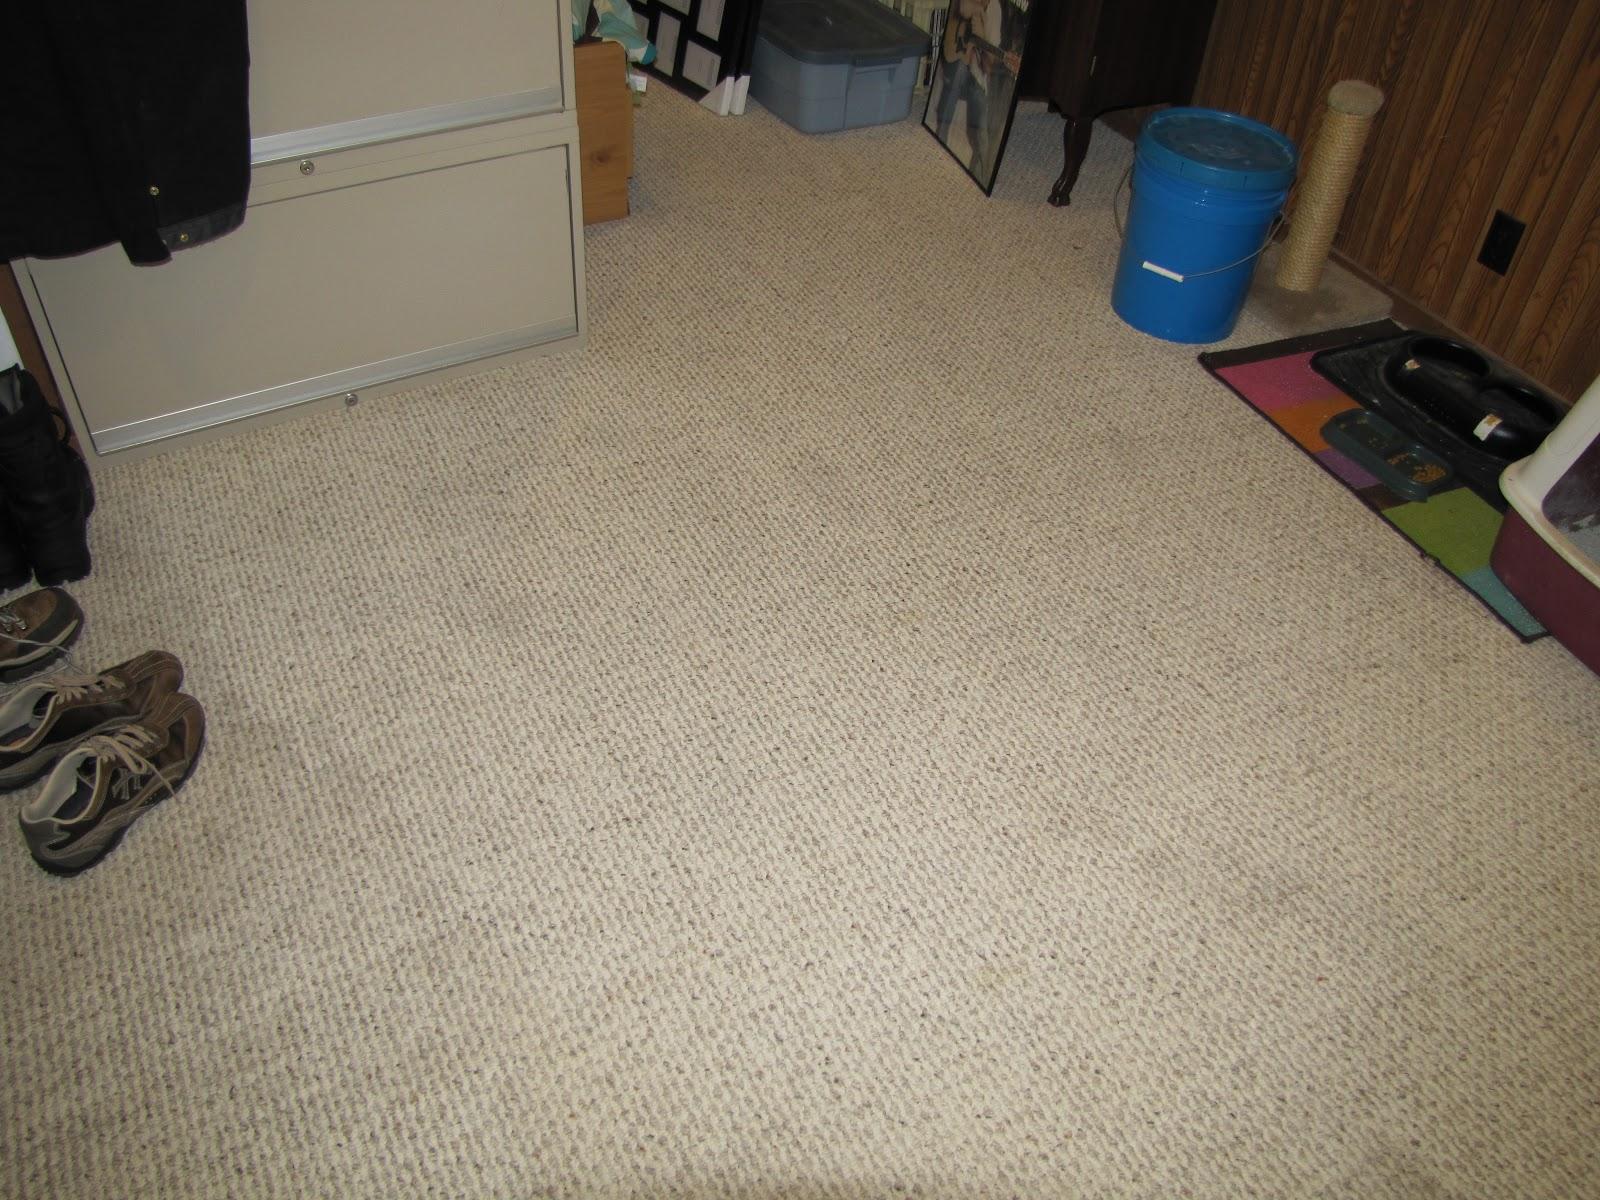 Genesis 950 Pet Stain Remover: Genesis 950 Carpet Cleaning